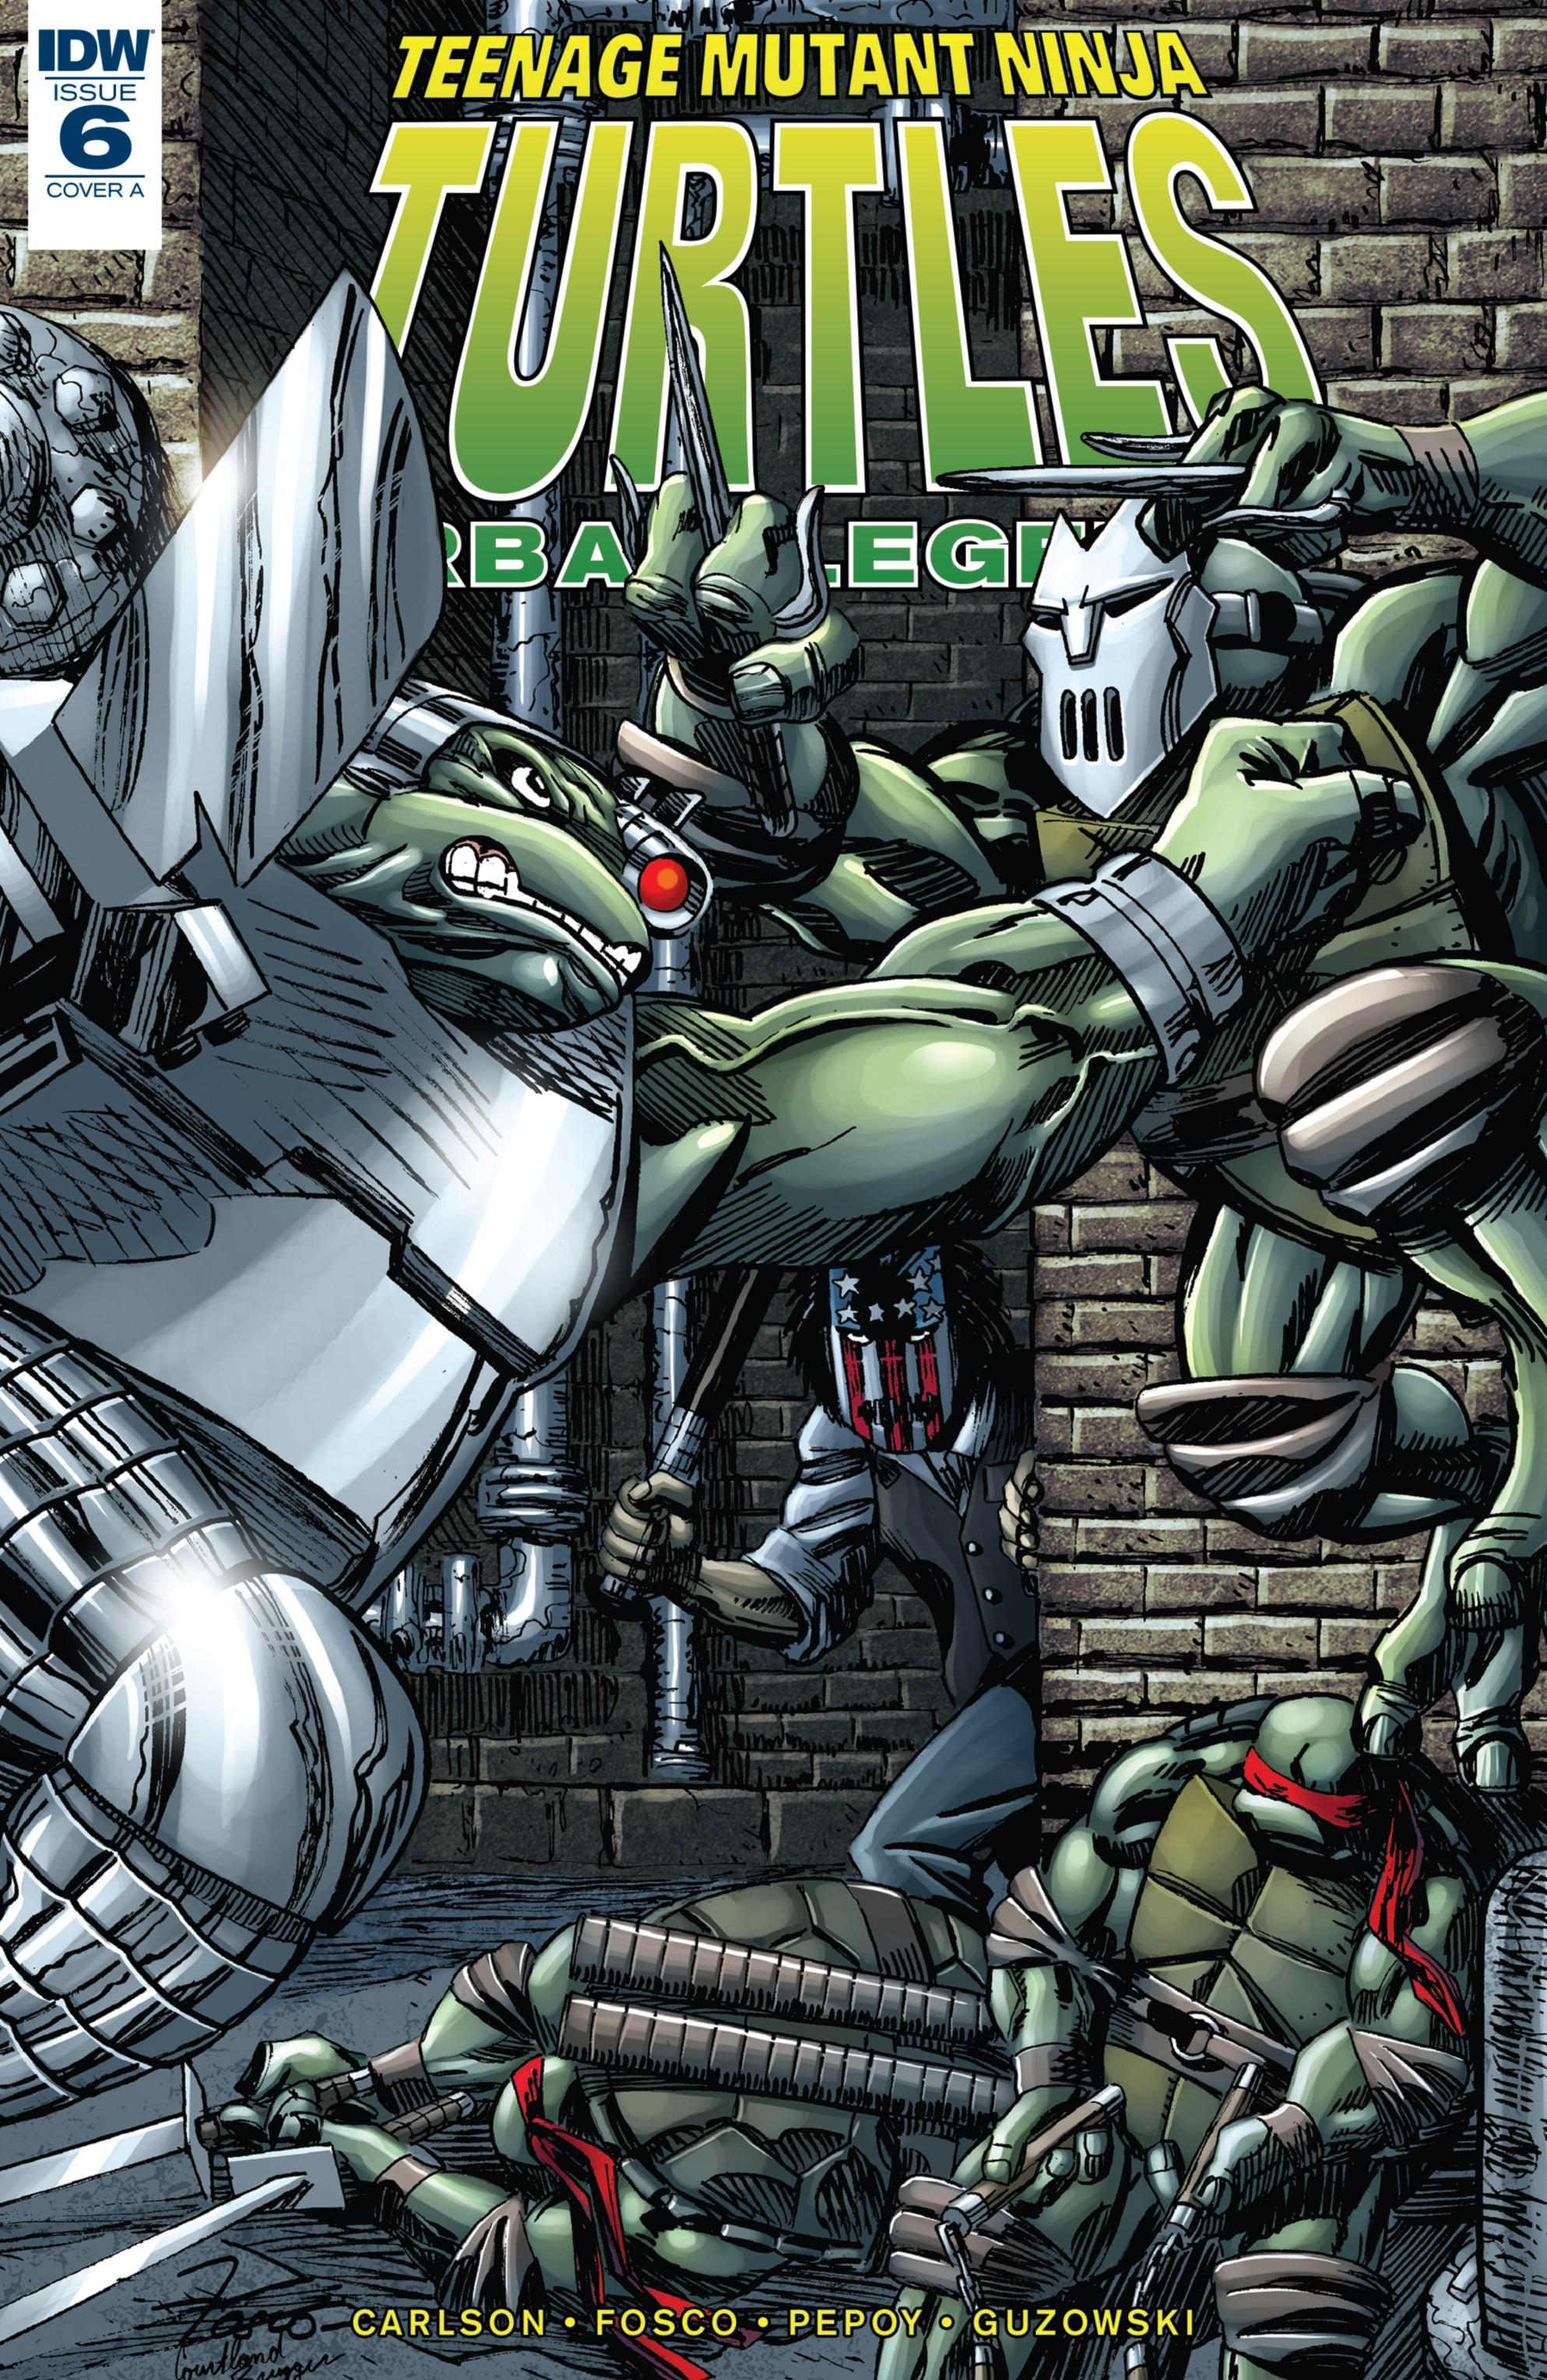 Download Teenage Mutant Ninja Turtles - Urban Legends 006